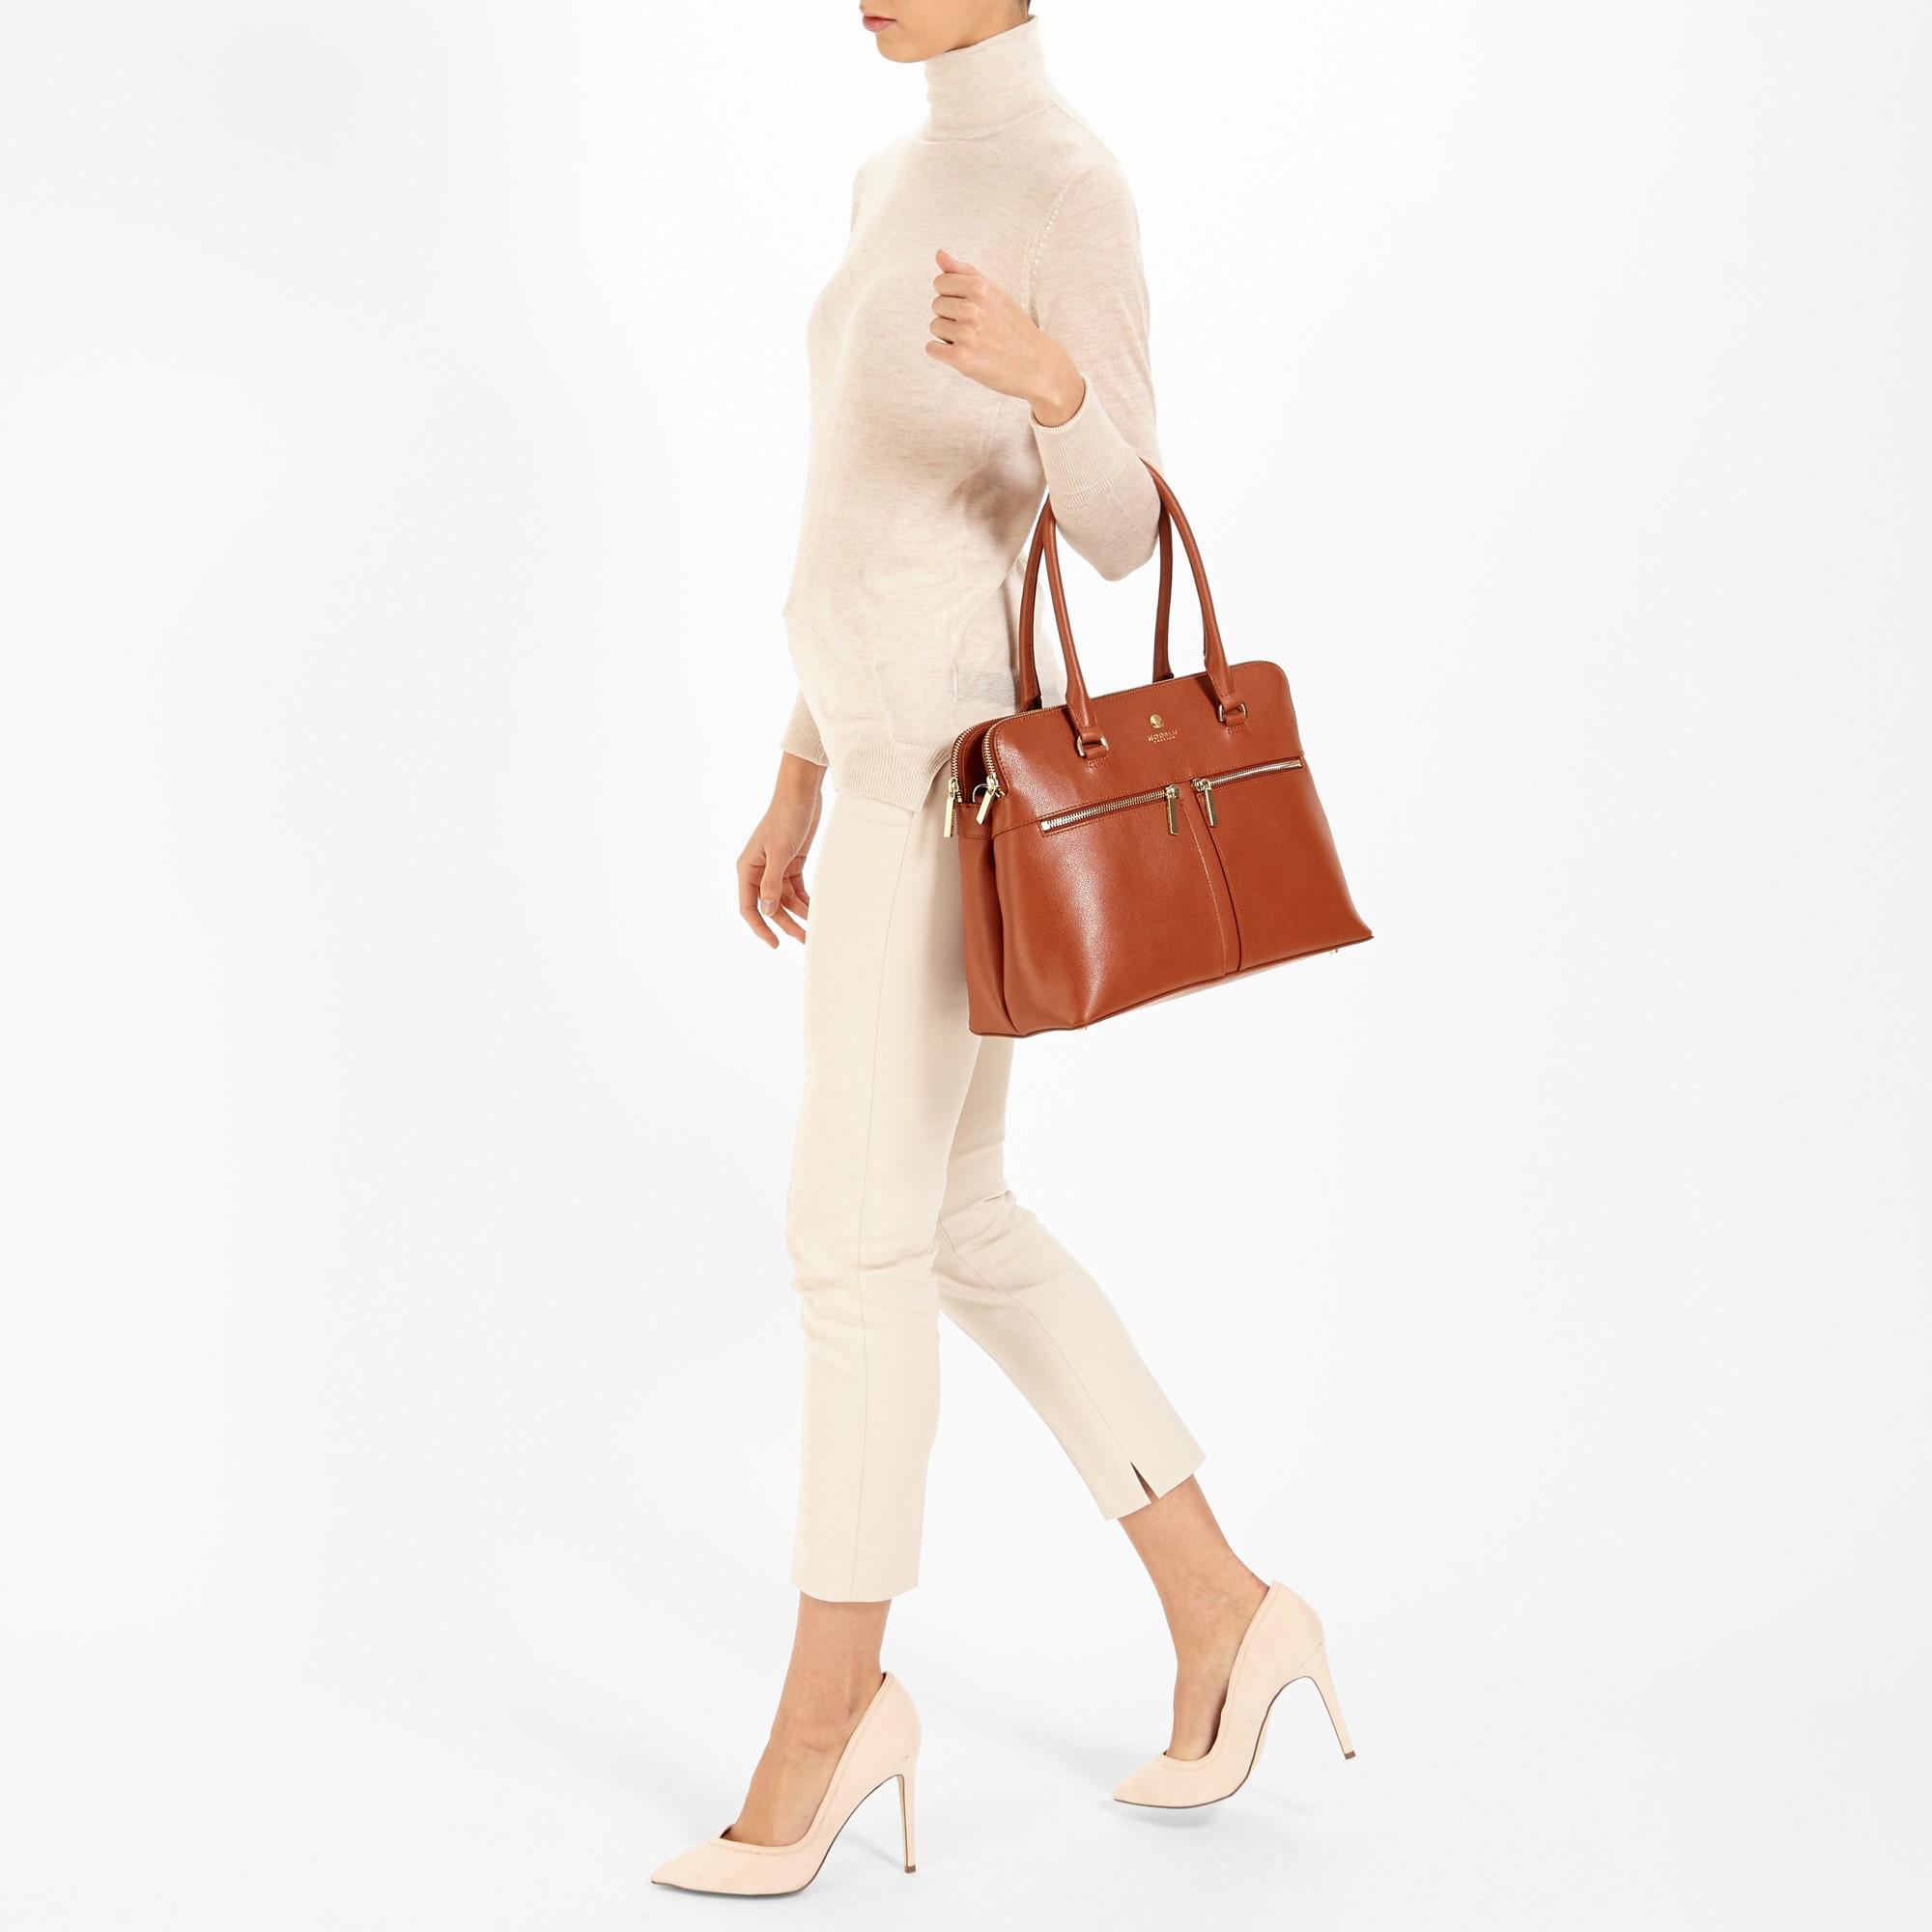 b60b93dd88 Gallery. Women s Louis Vuitton Neverfull Women s Bowling Bags ...